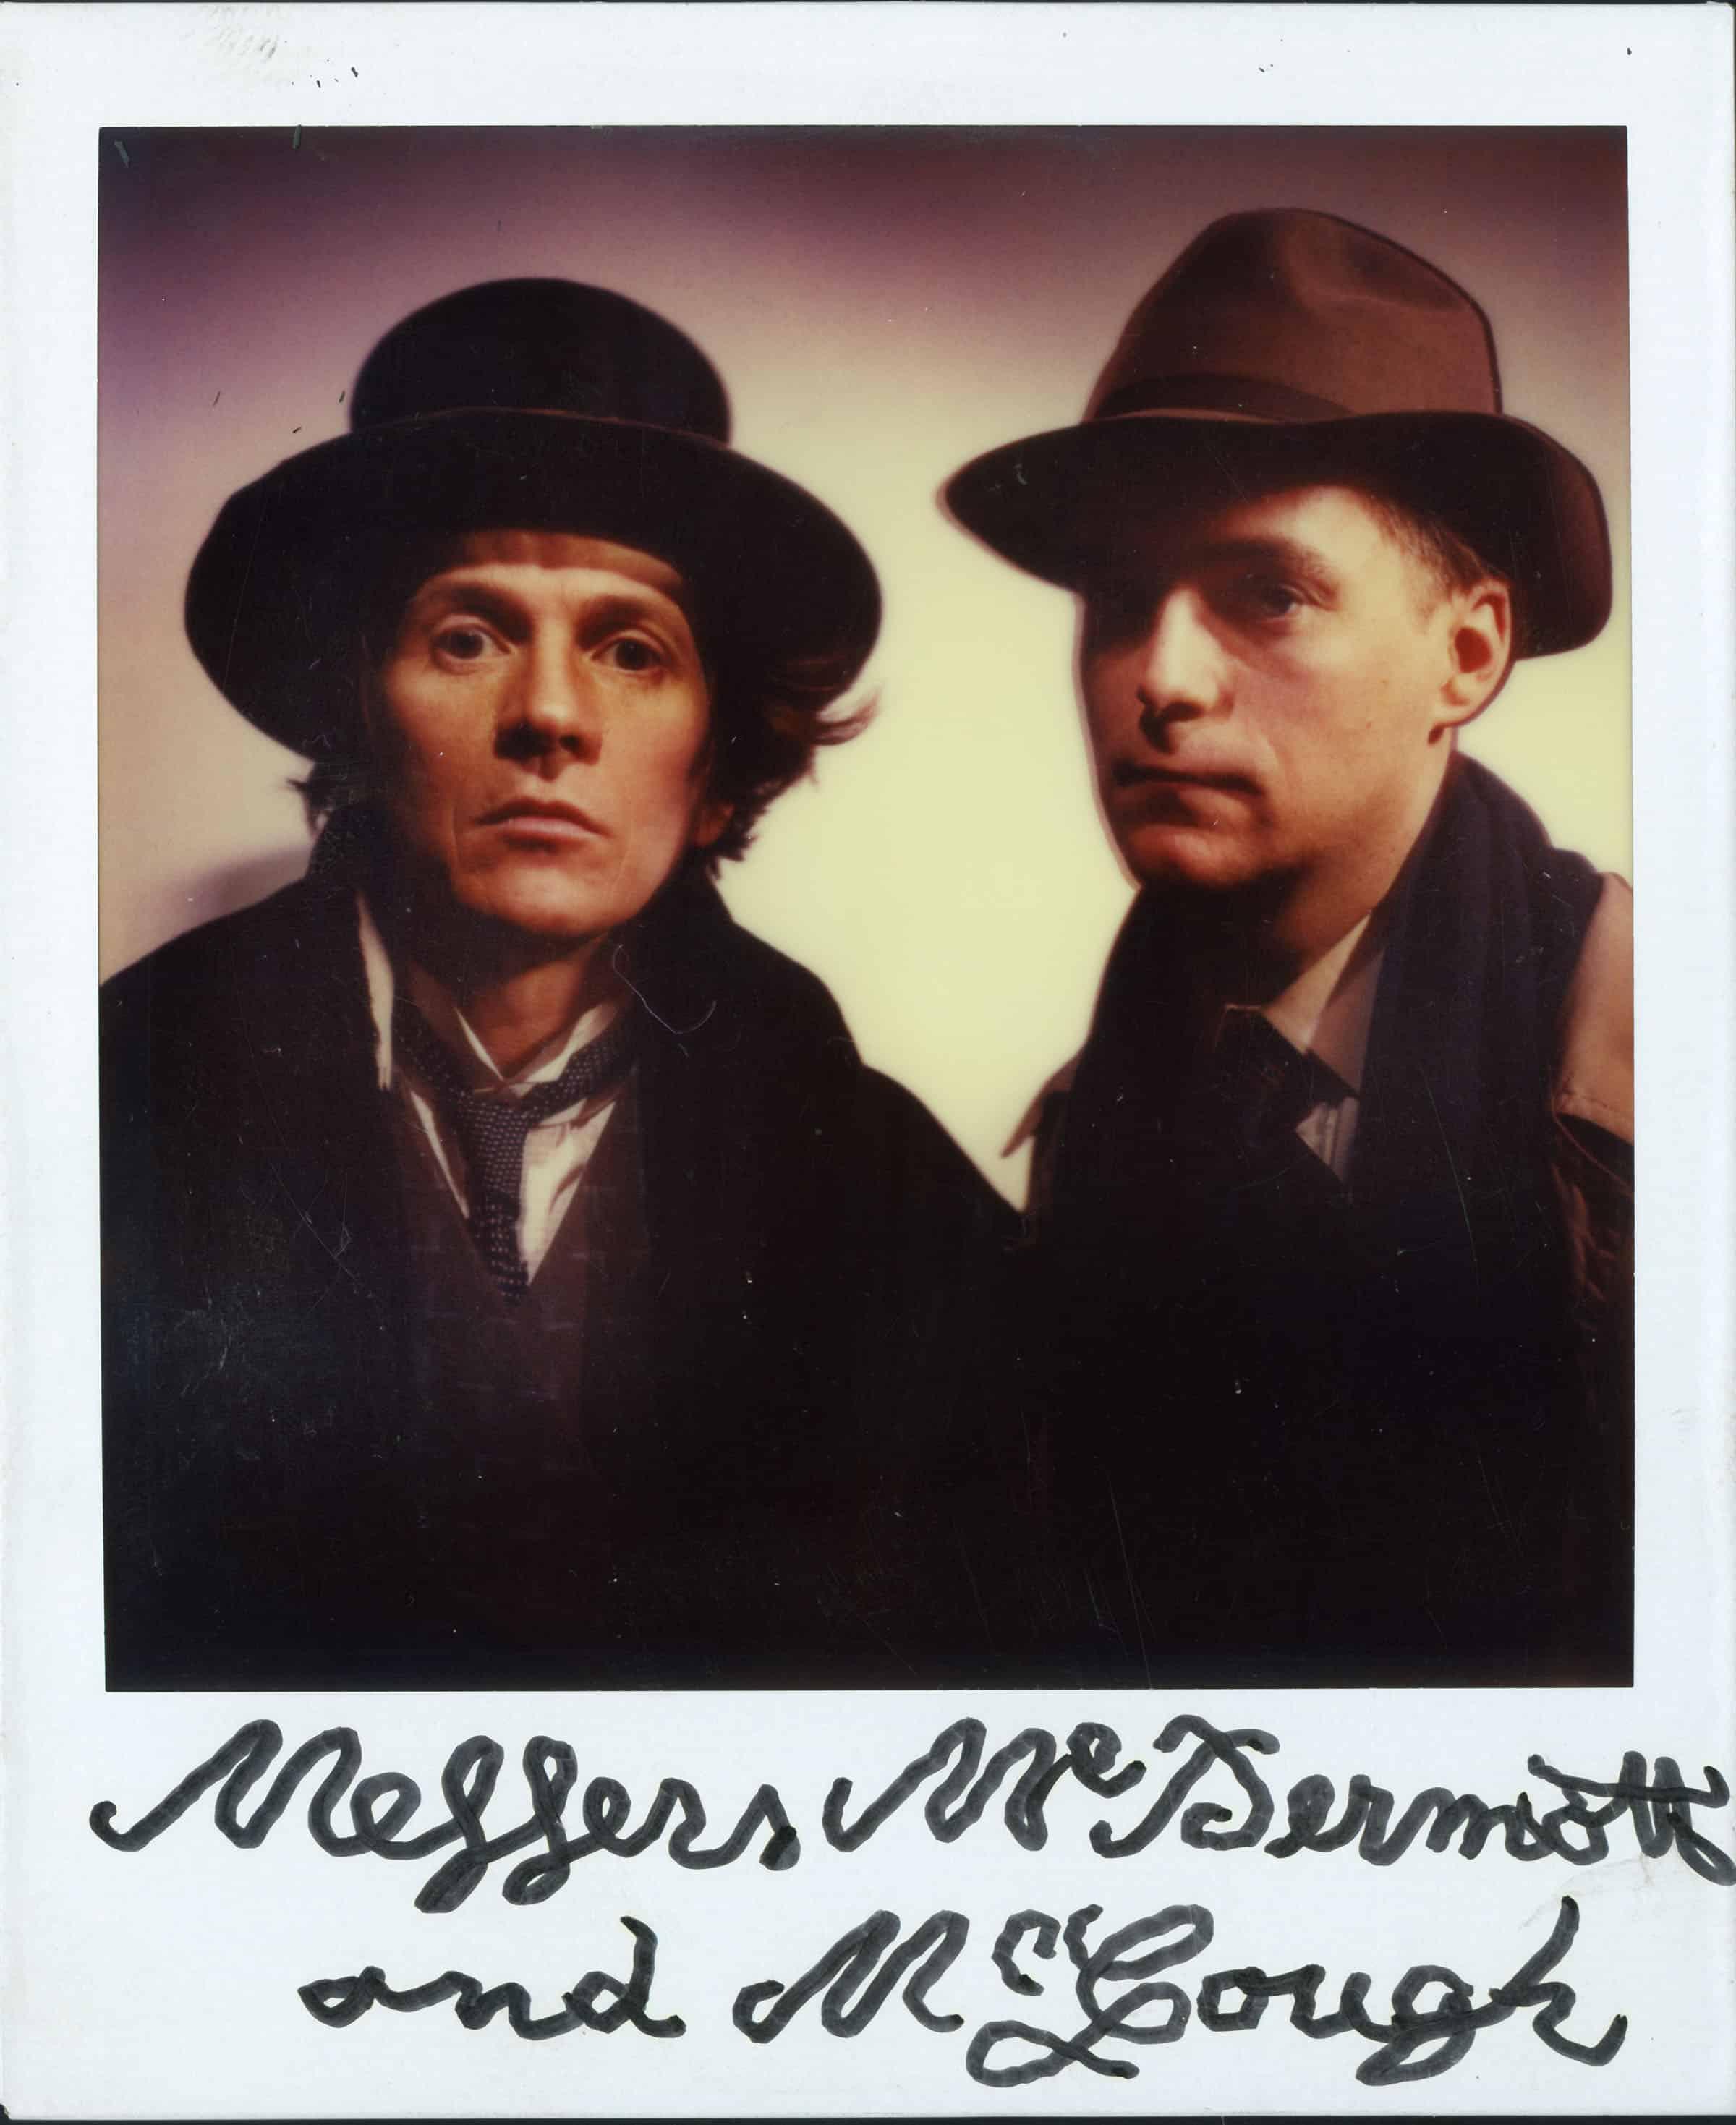 Mc Dermott and McGough_Polaroids342